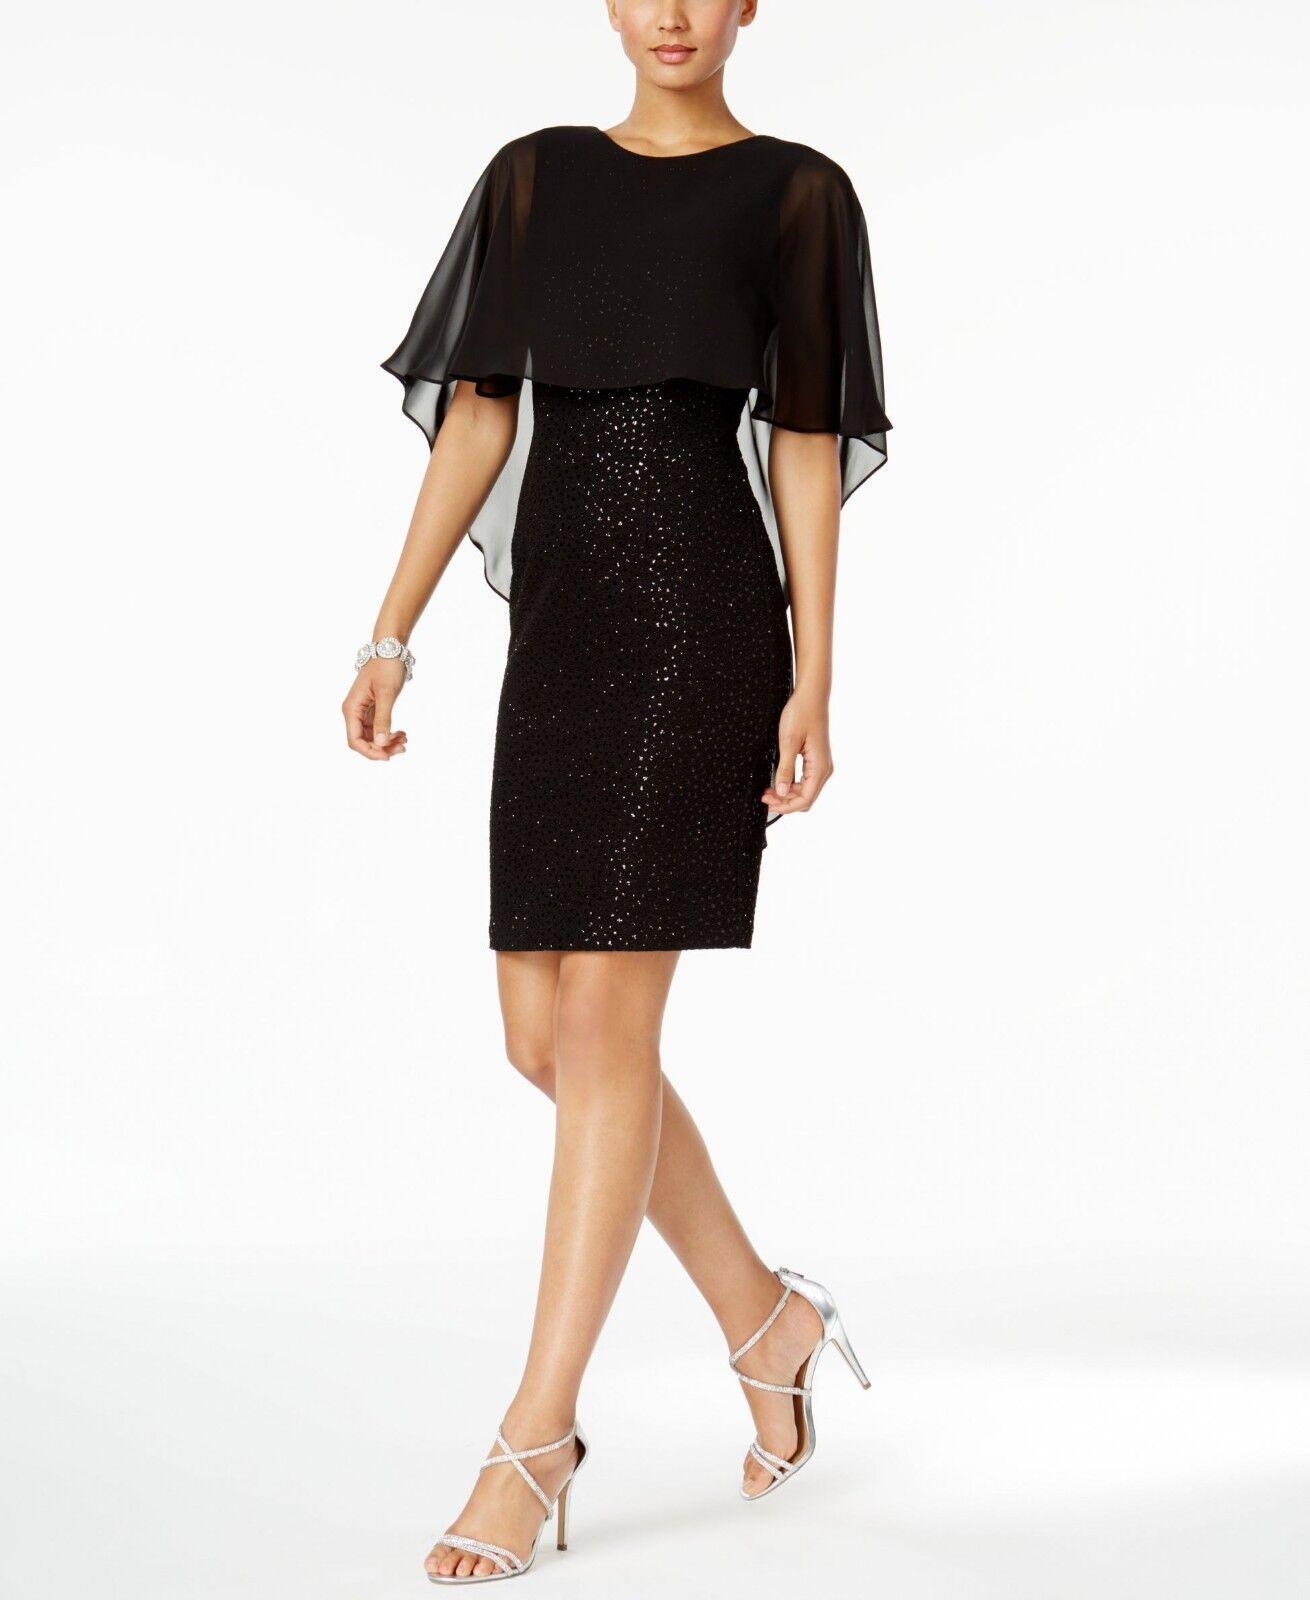 Betsy & Adam Cape Sheath Dress Size 4  B543 MSRP  179.00.